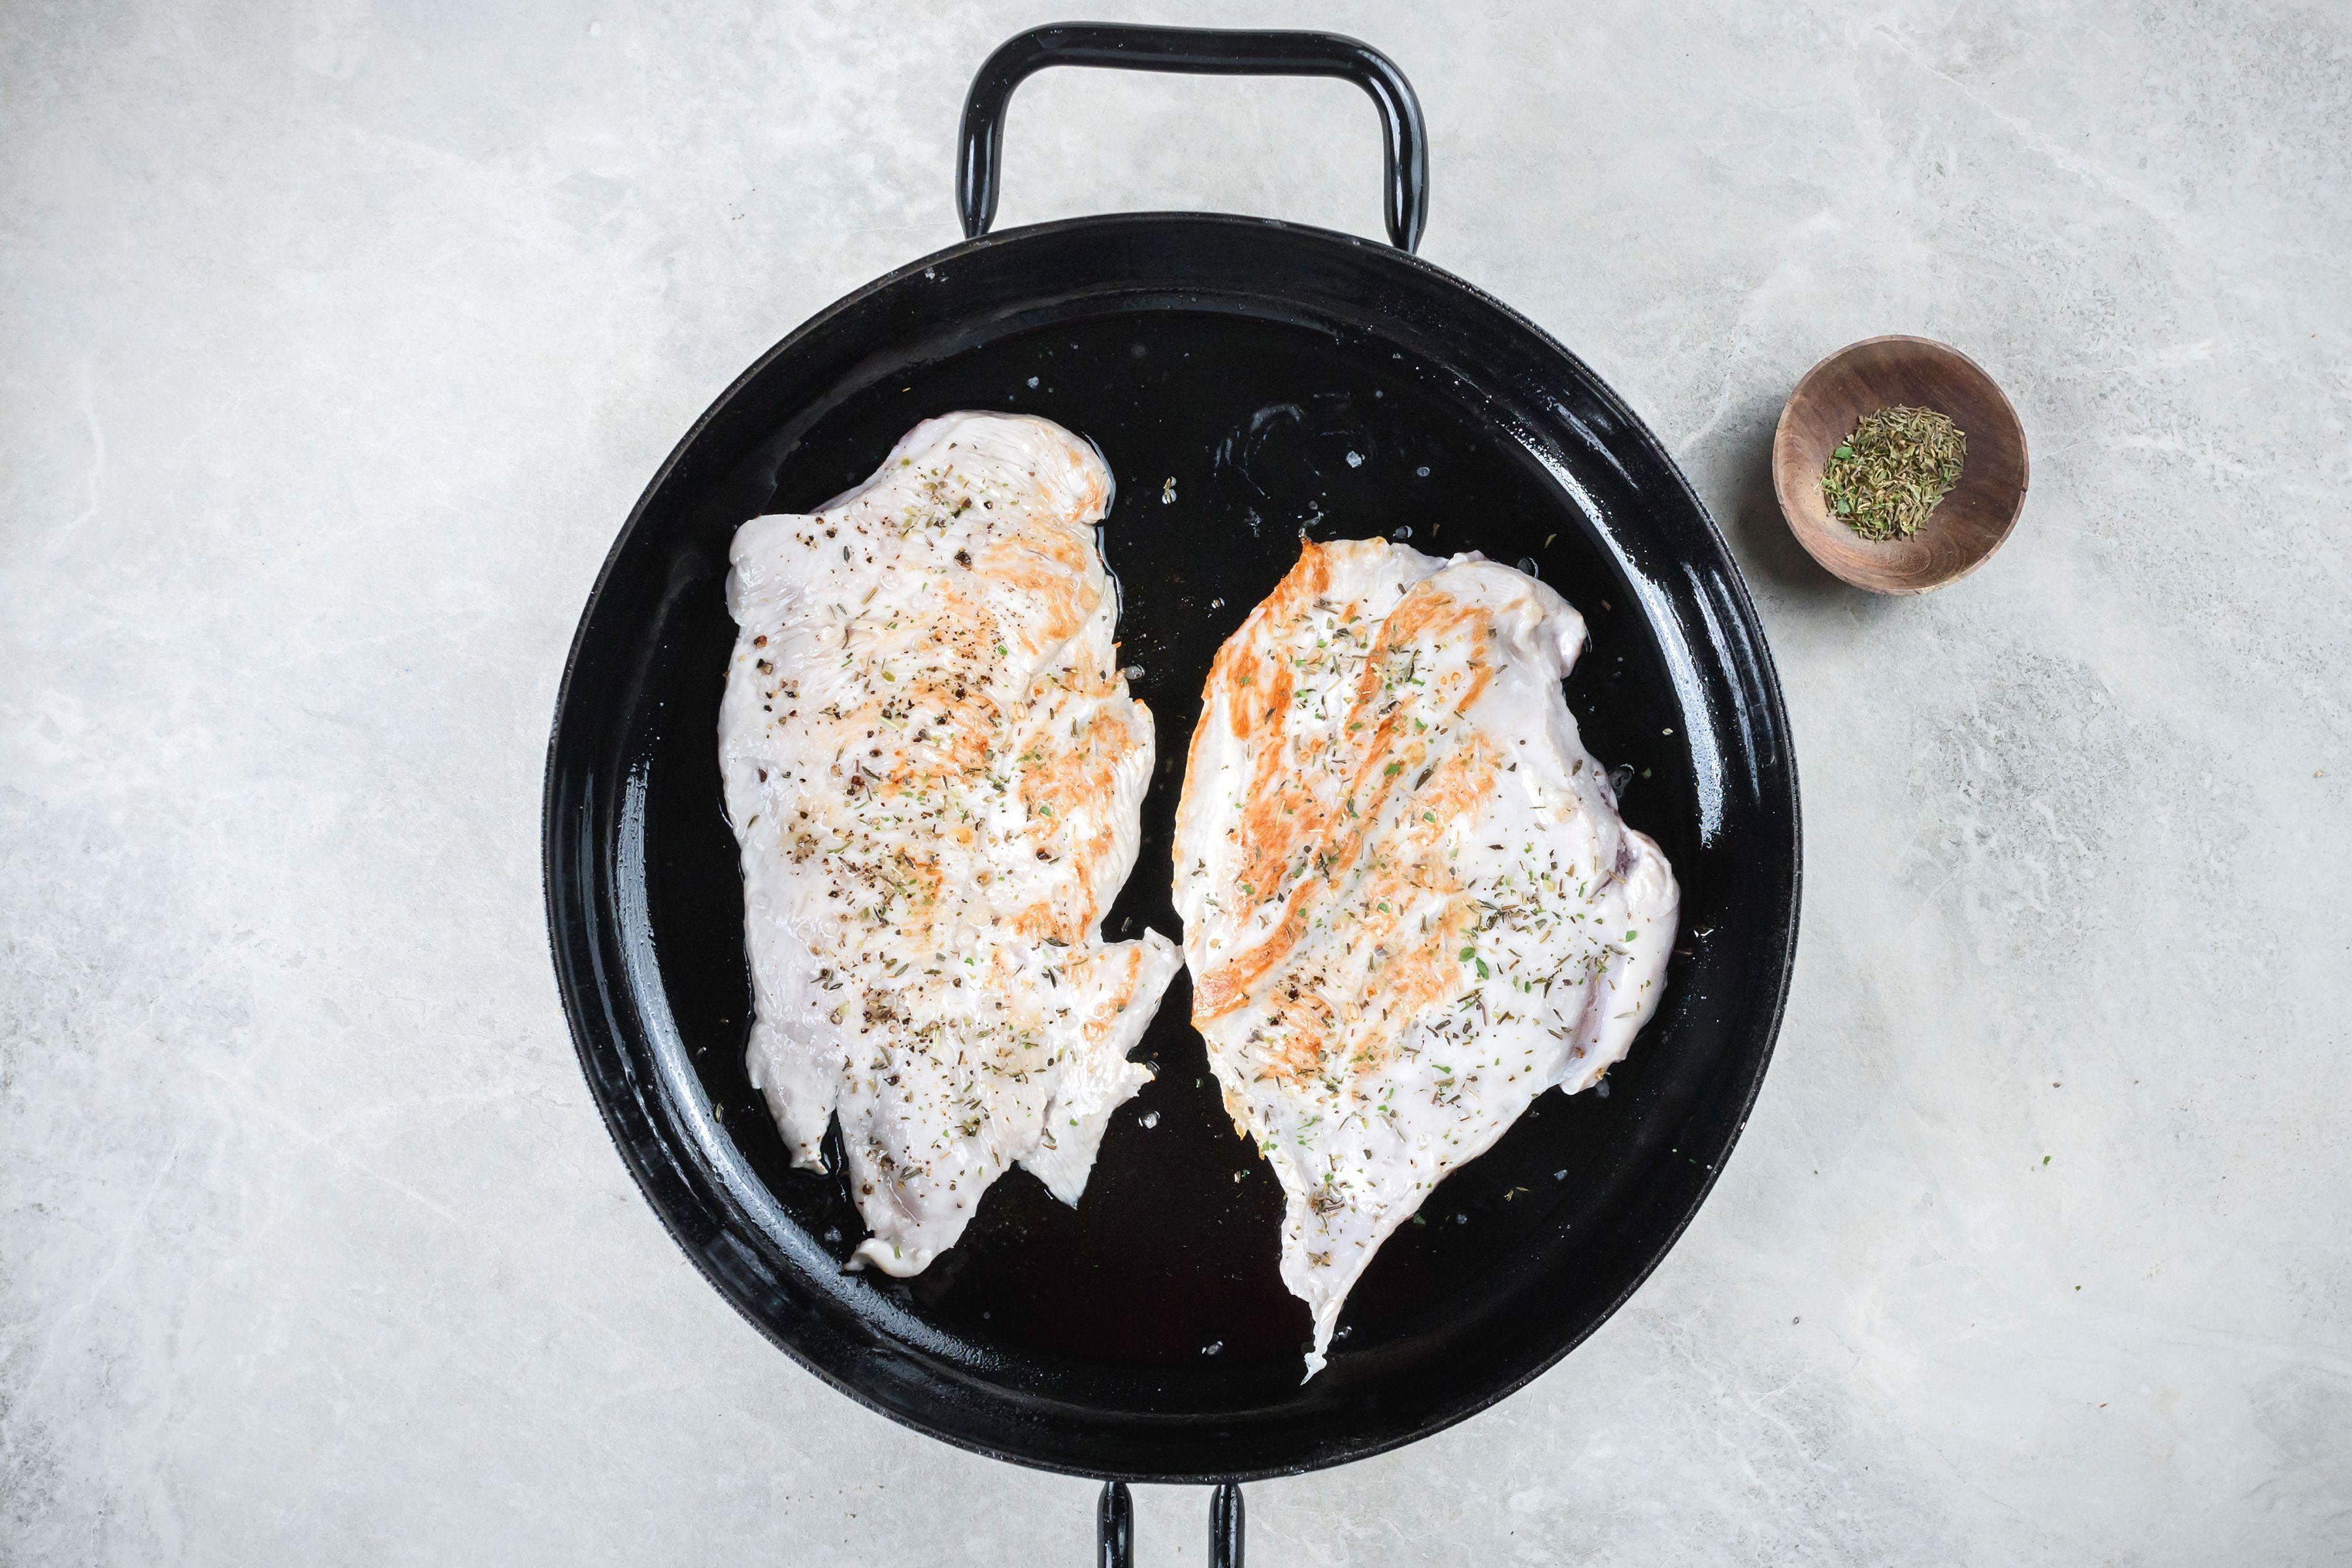 Turkey breasts in skillet with sprinkled herbs